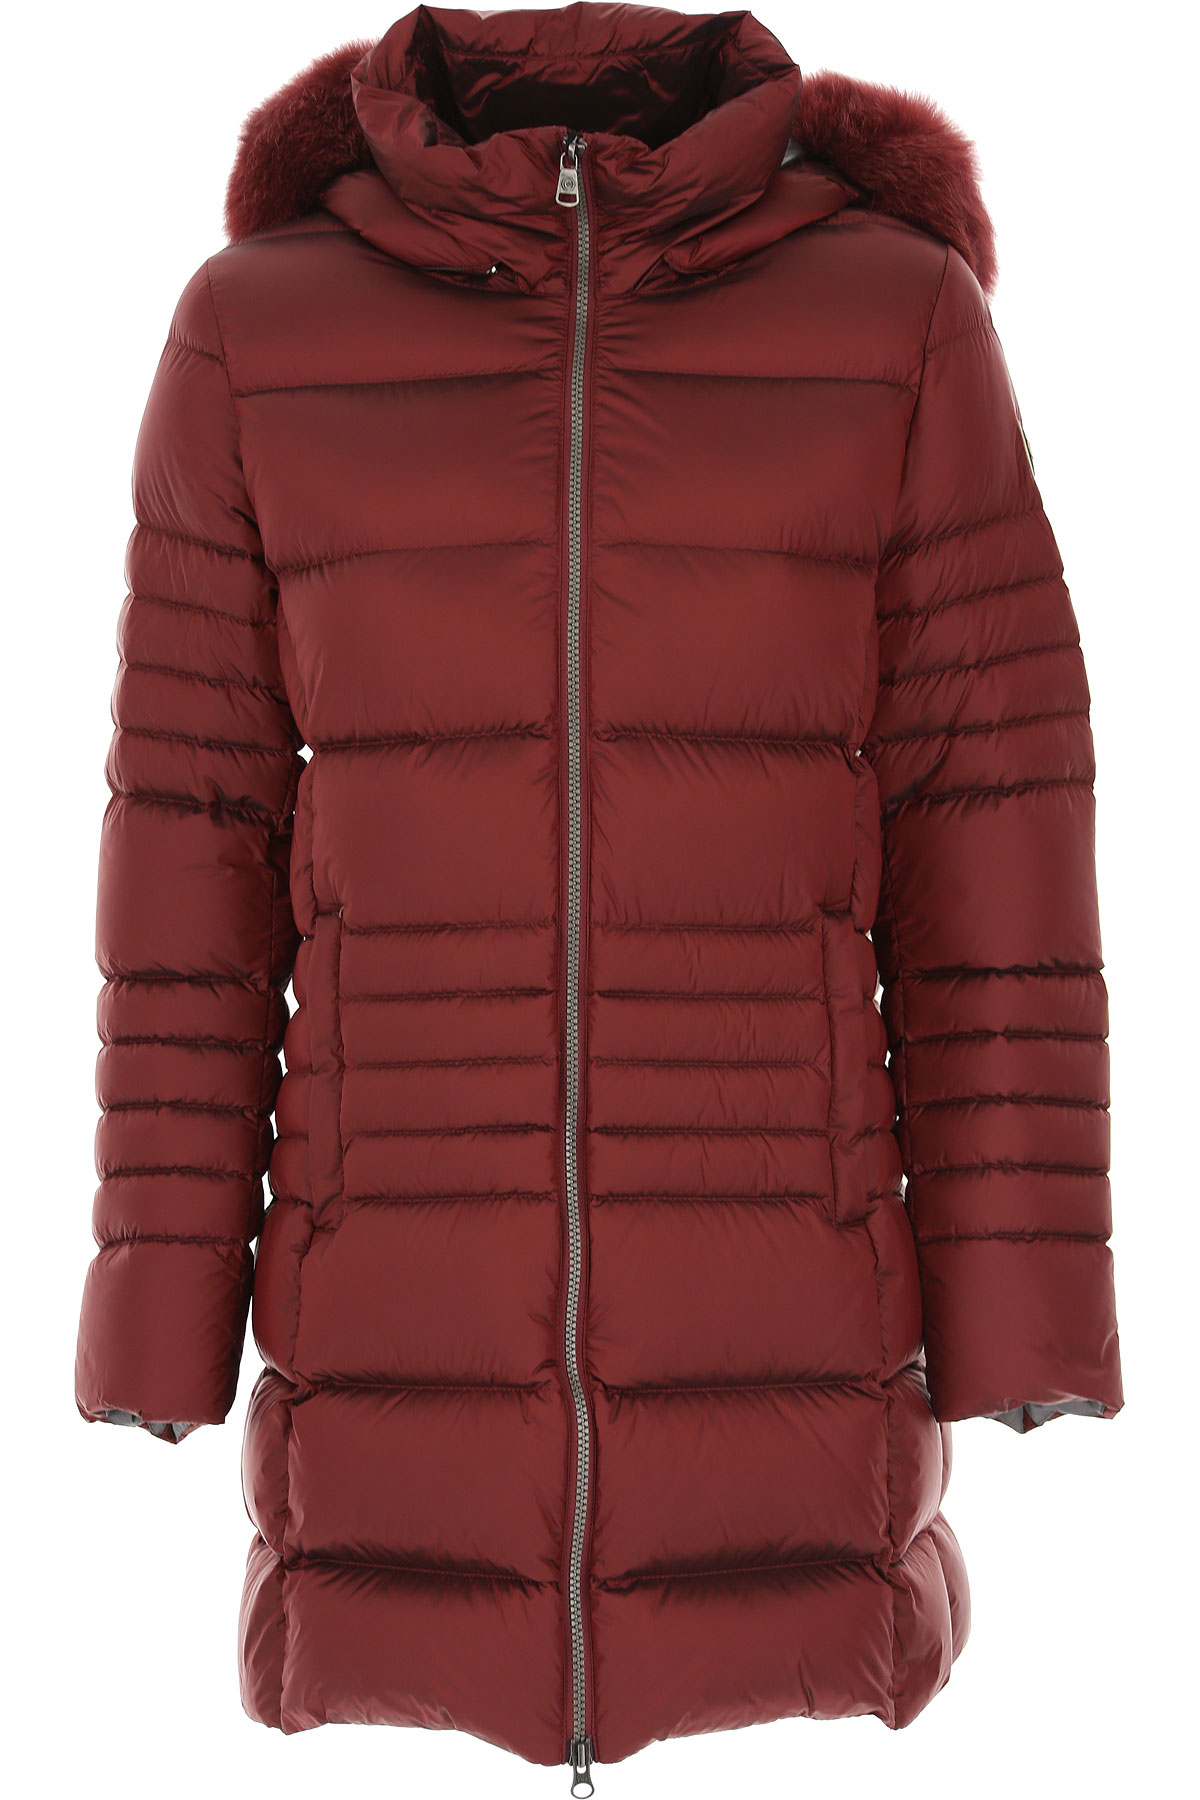 Colmar Down Jacket for Women, Puffer Ski Jacket On Sale, Black Check, polyamide, 2019, 10 12 4 6 8